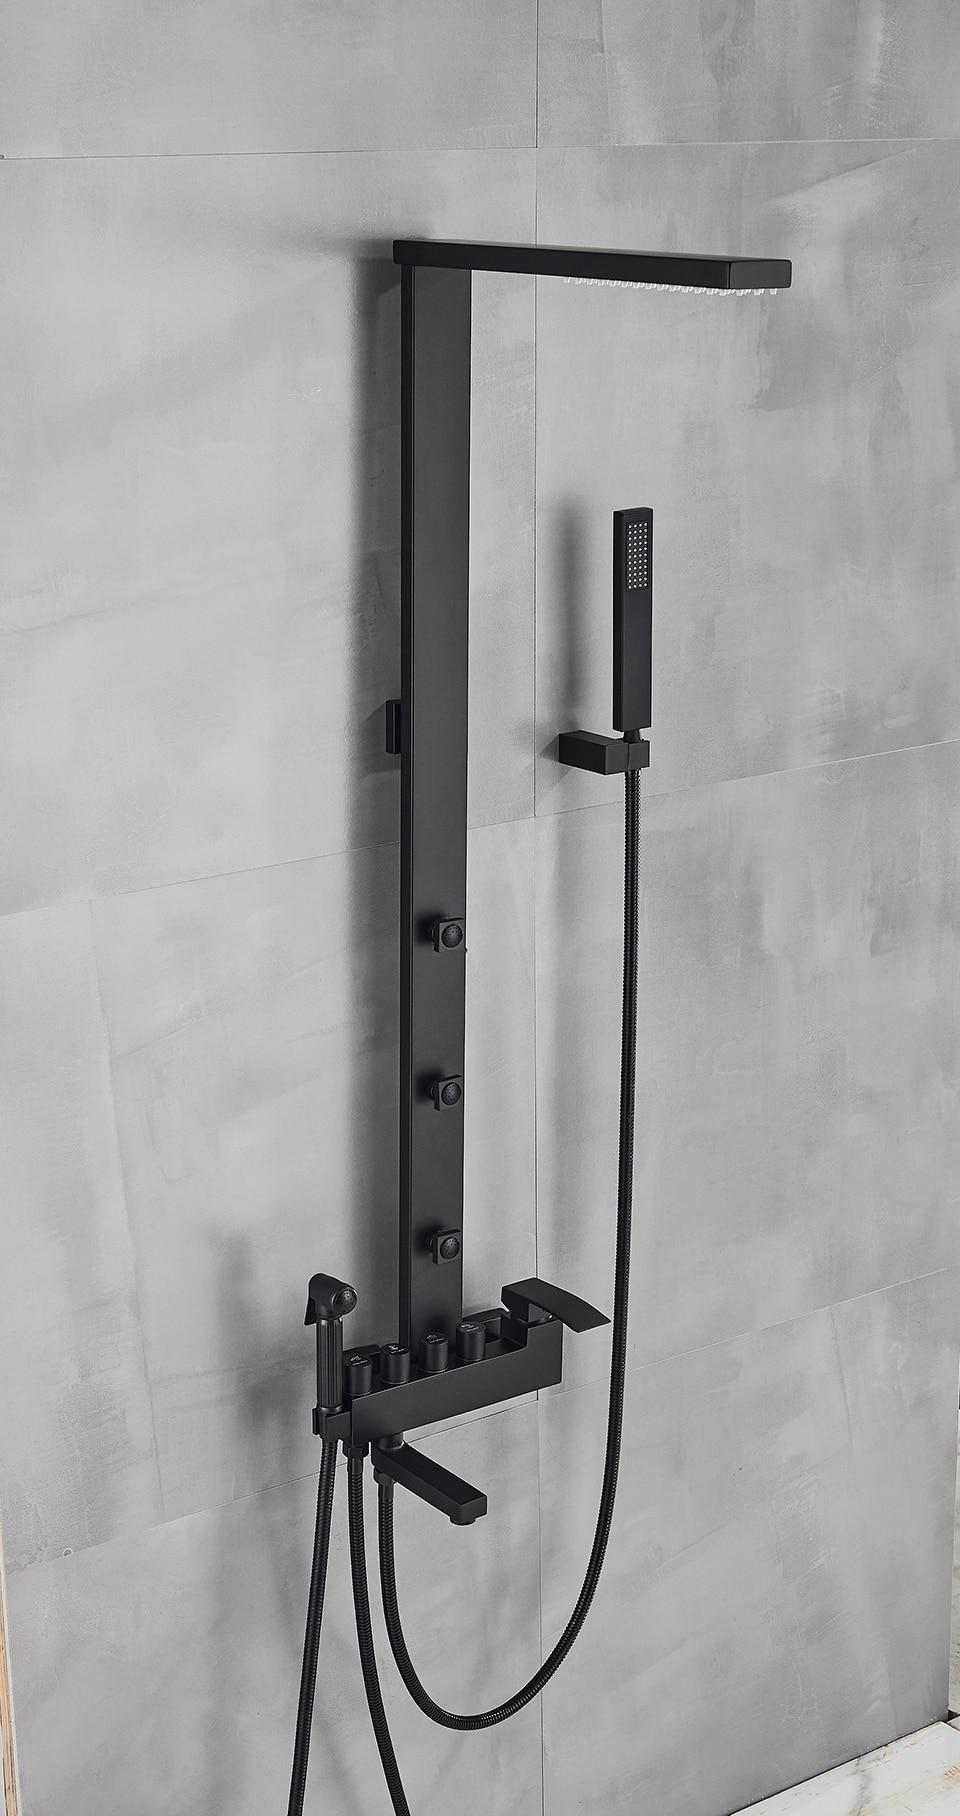 Hf8ea1806eb61418d9ae394fc1d89f5e3k Uythner Luxury Matte Black Bathroom Faucet Bath Rain Shower Faucet Wall Mounted Bathtub Shower Mixer Bidet Tap Shower Set Mixer